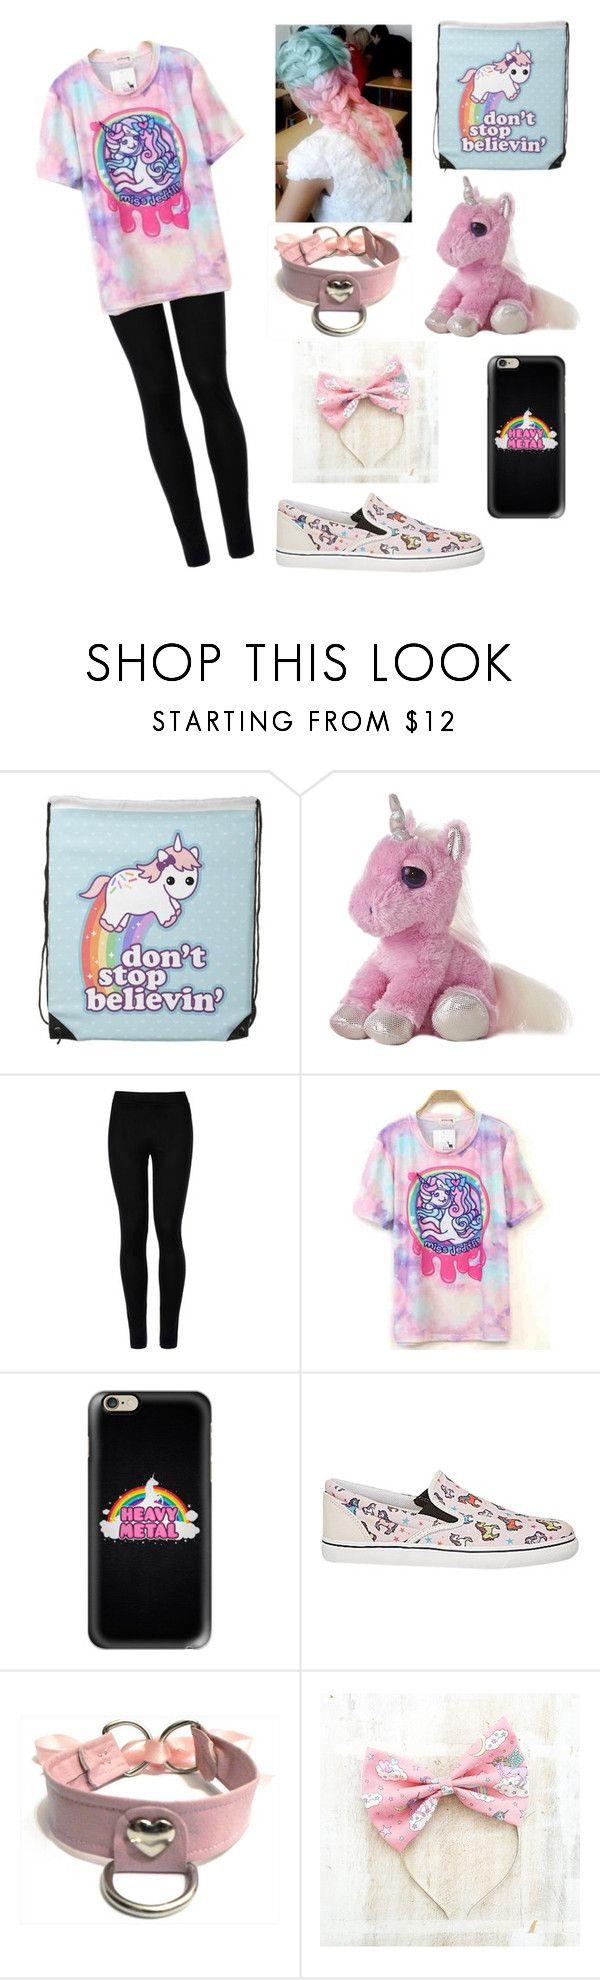 best 25 unicorn land ideas on pinterest unicorn coloring pages